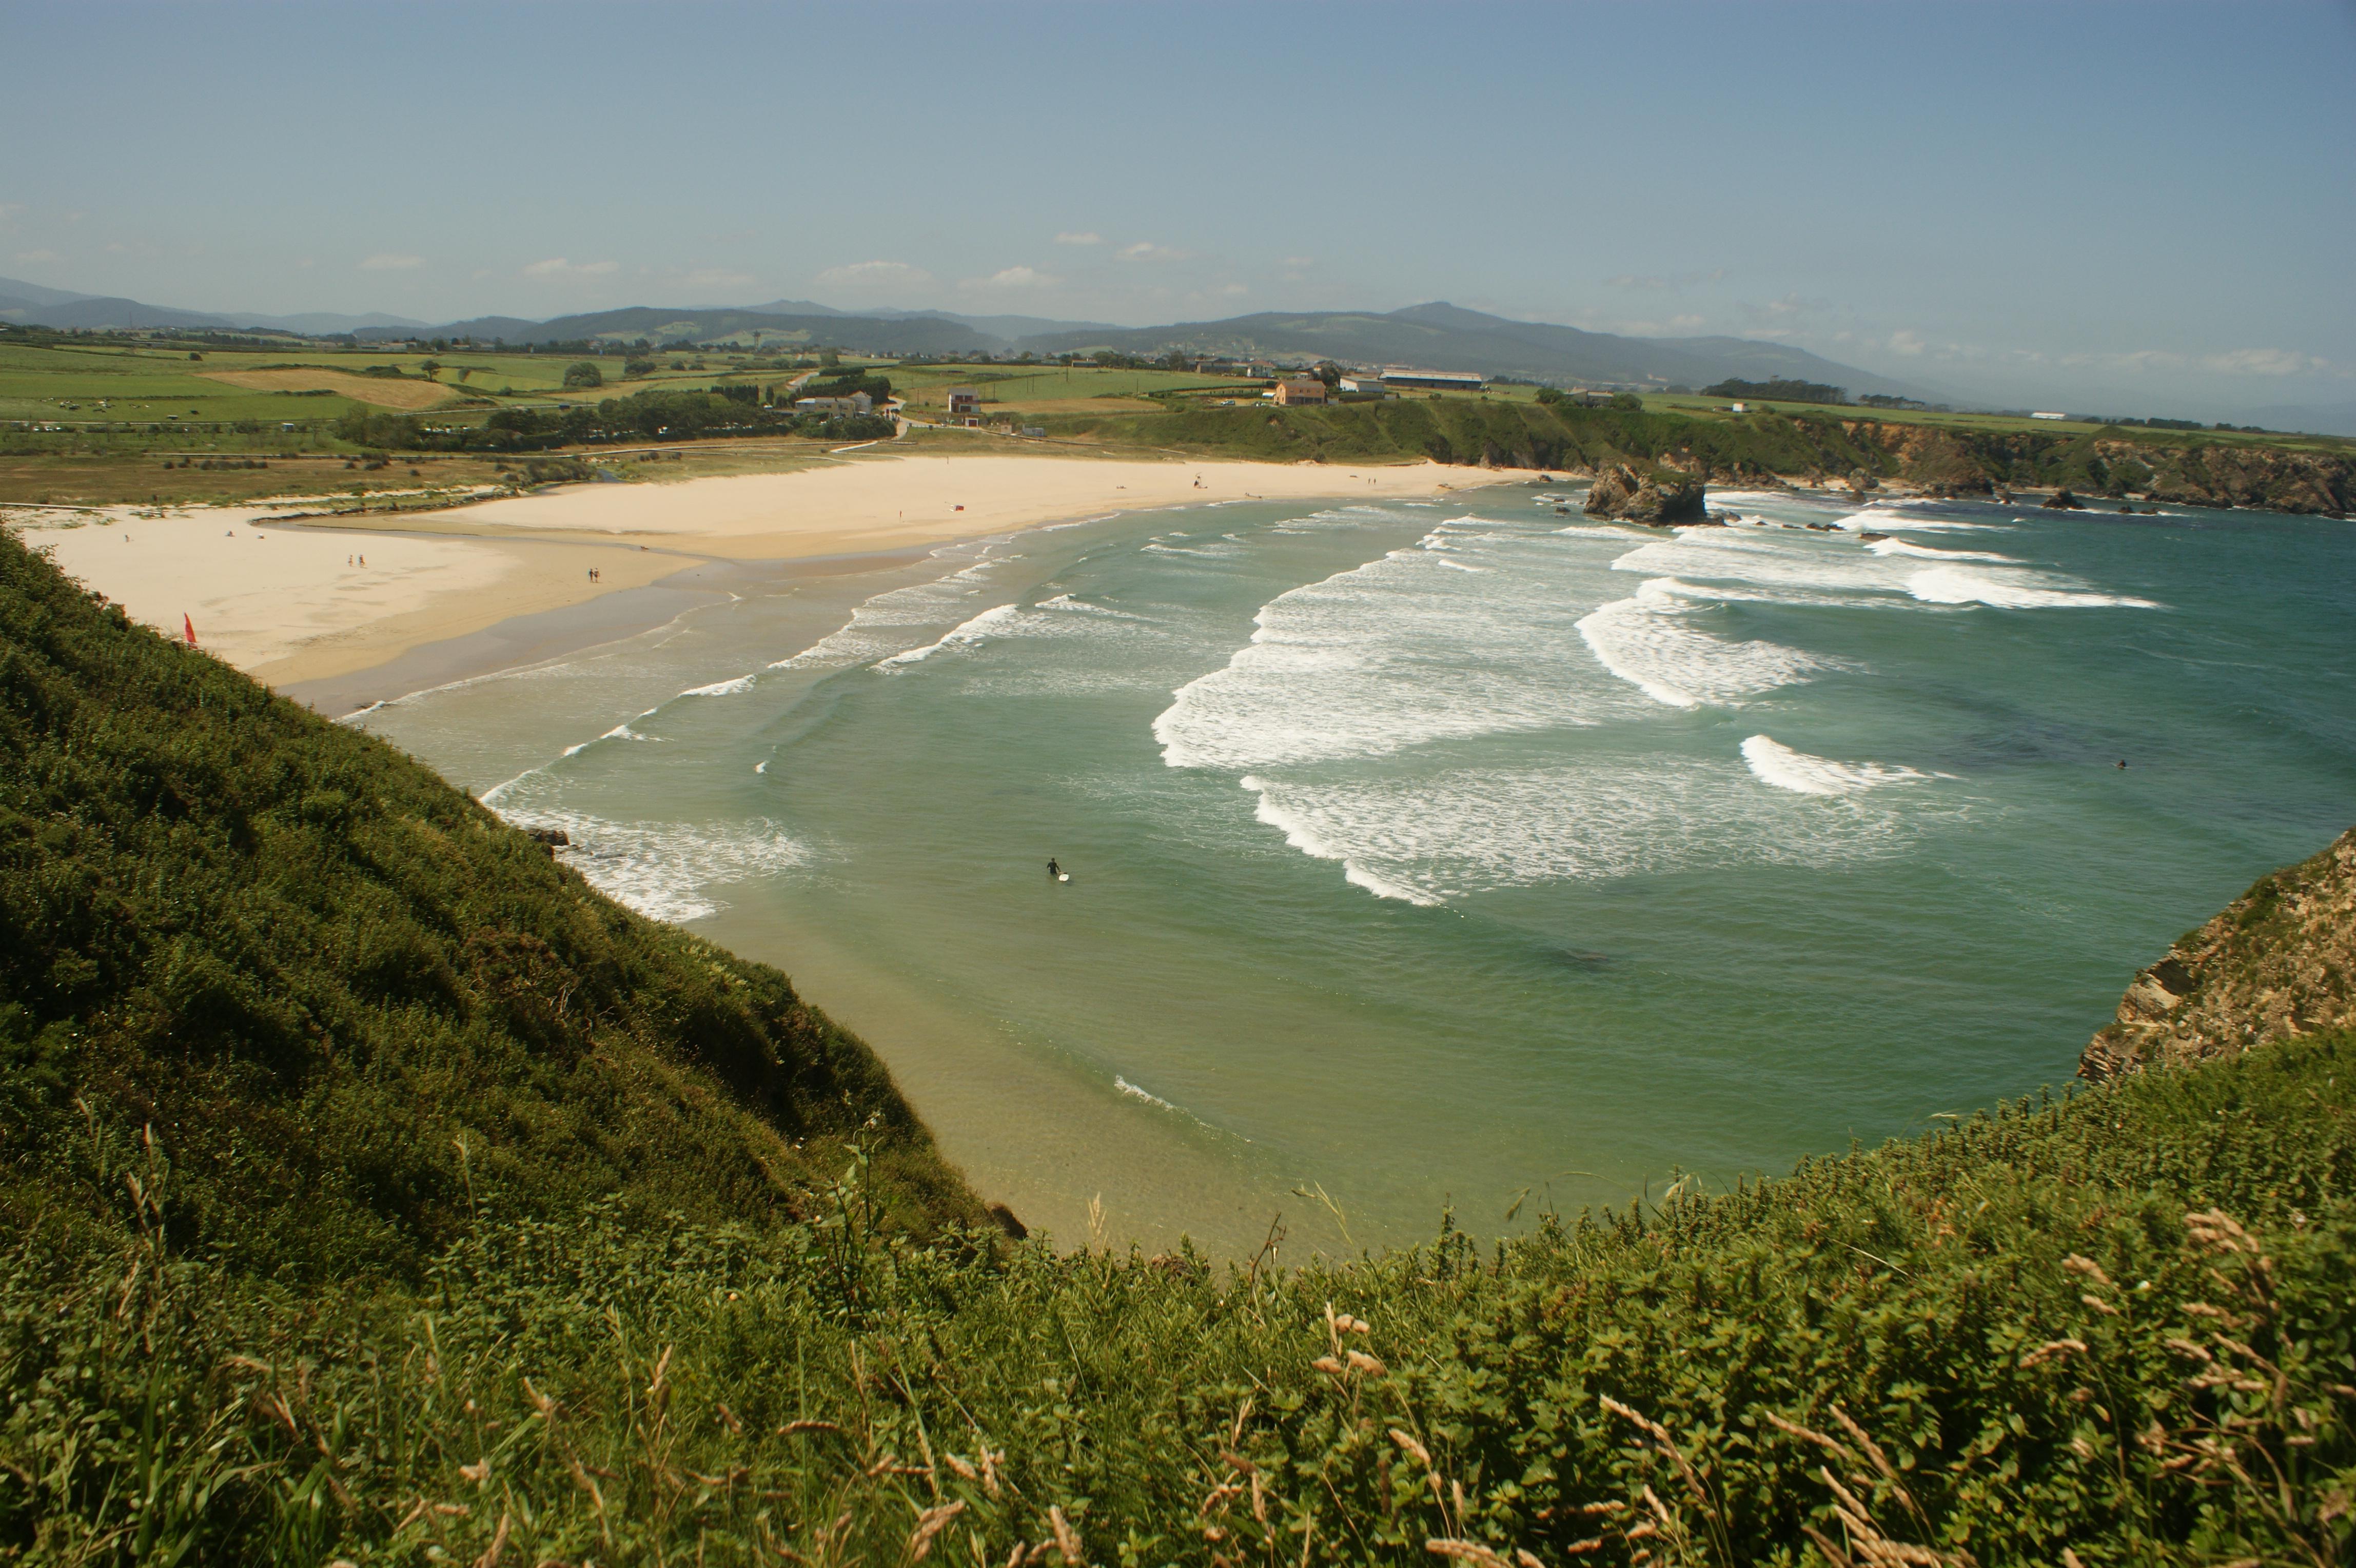 mejores playas españa penarronda